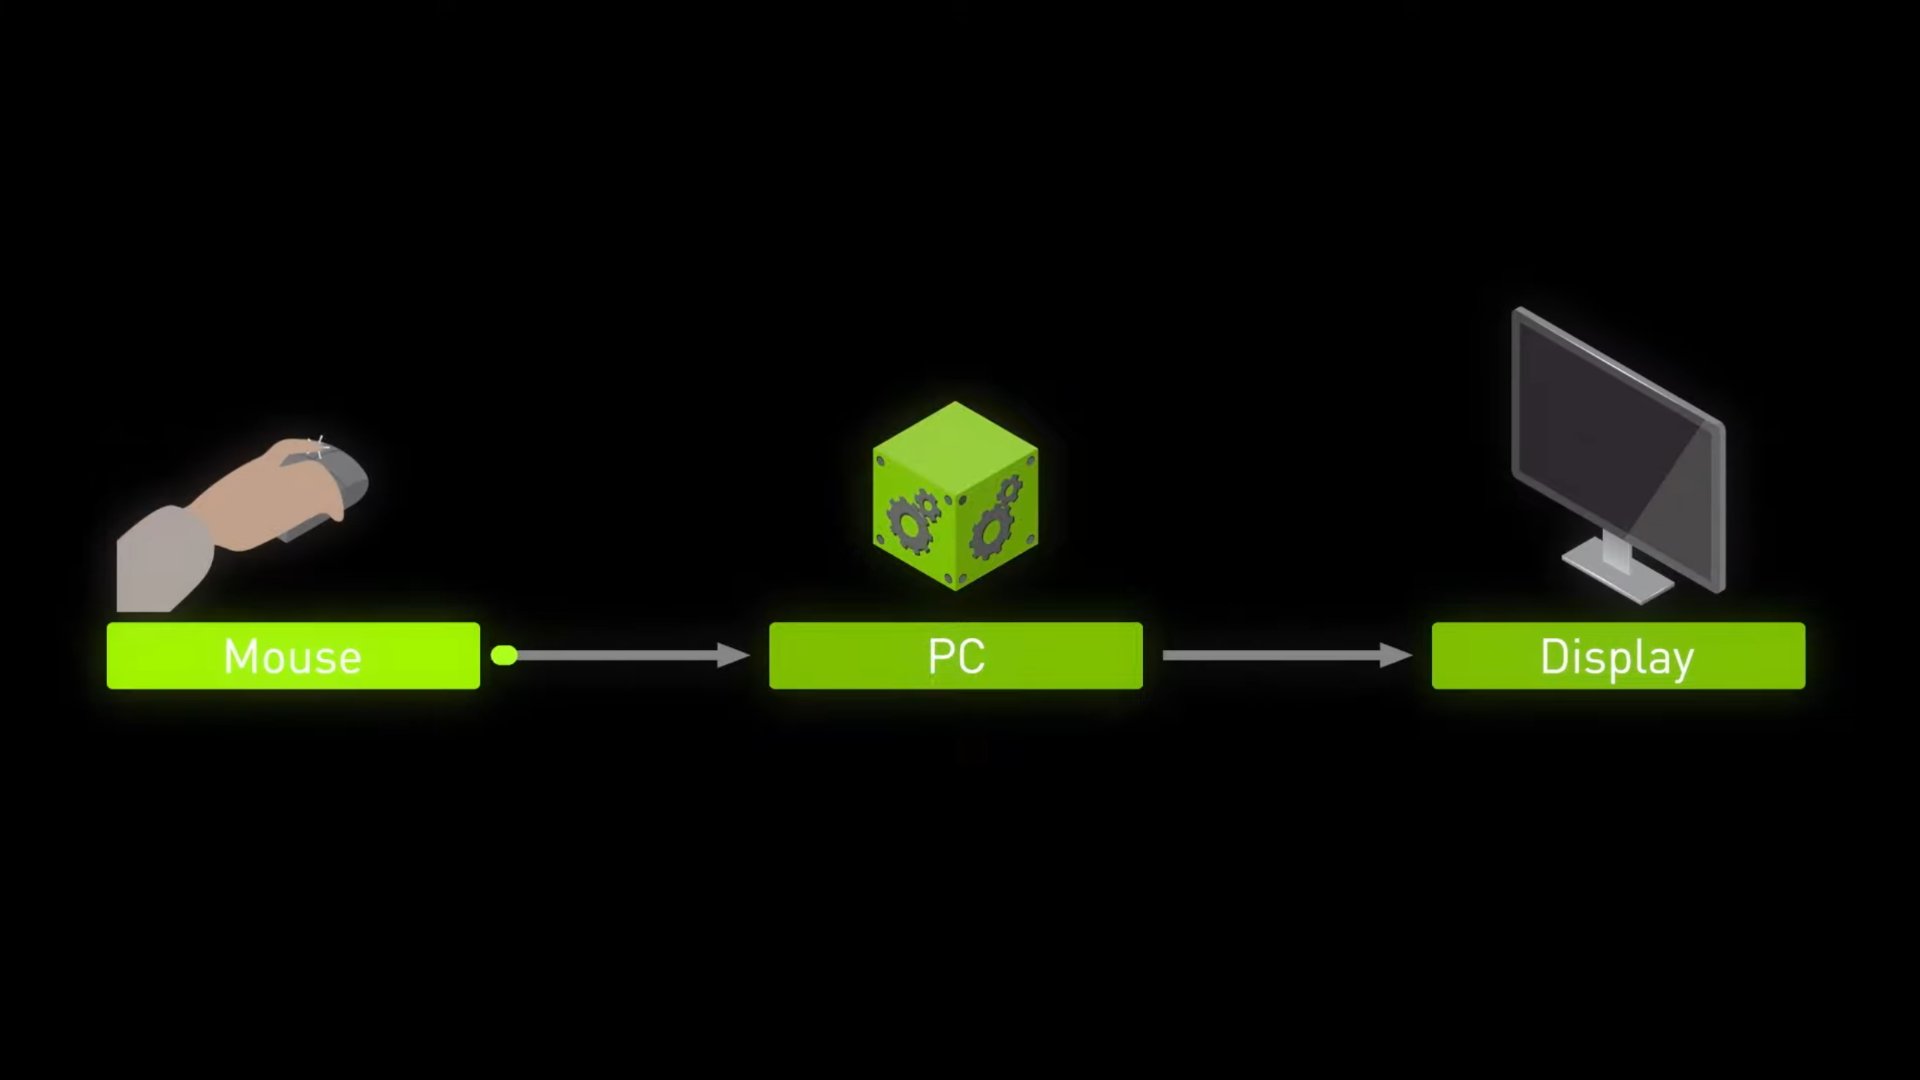 Nvidia Reflex چیست ؟ 5 نکته جالب درباره انویدیا رفلکس! فروشگاه اینترنتی آی تی اس کالا